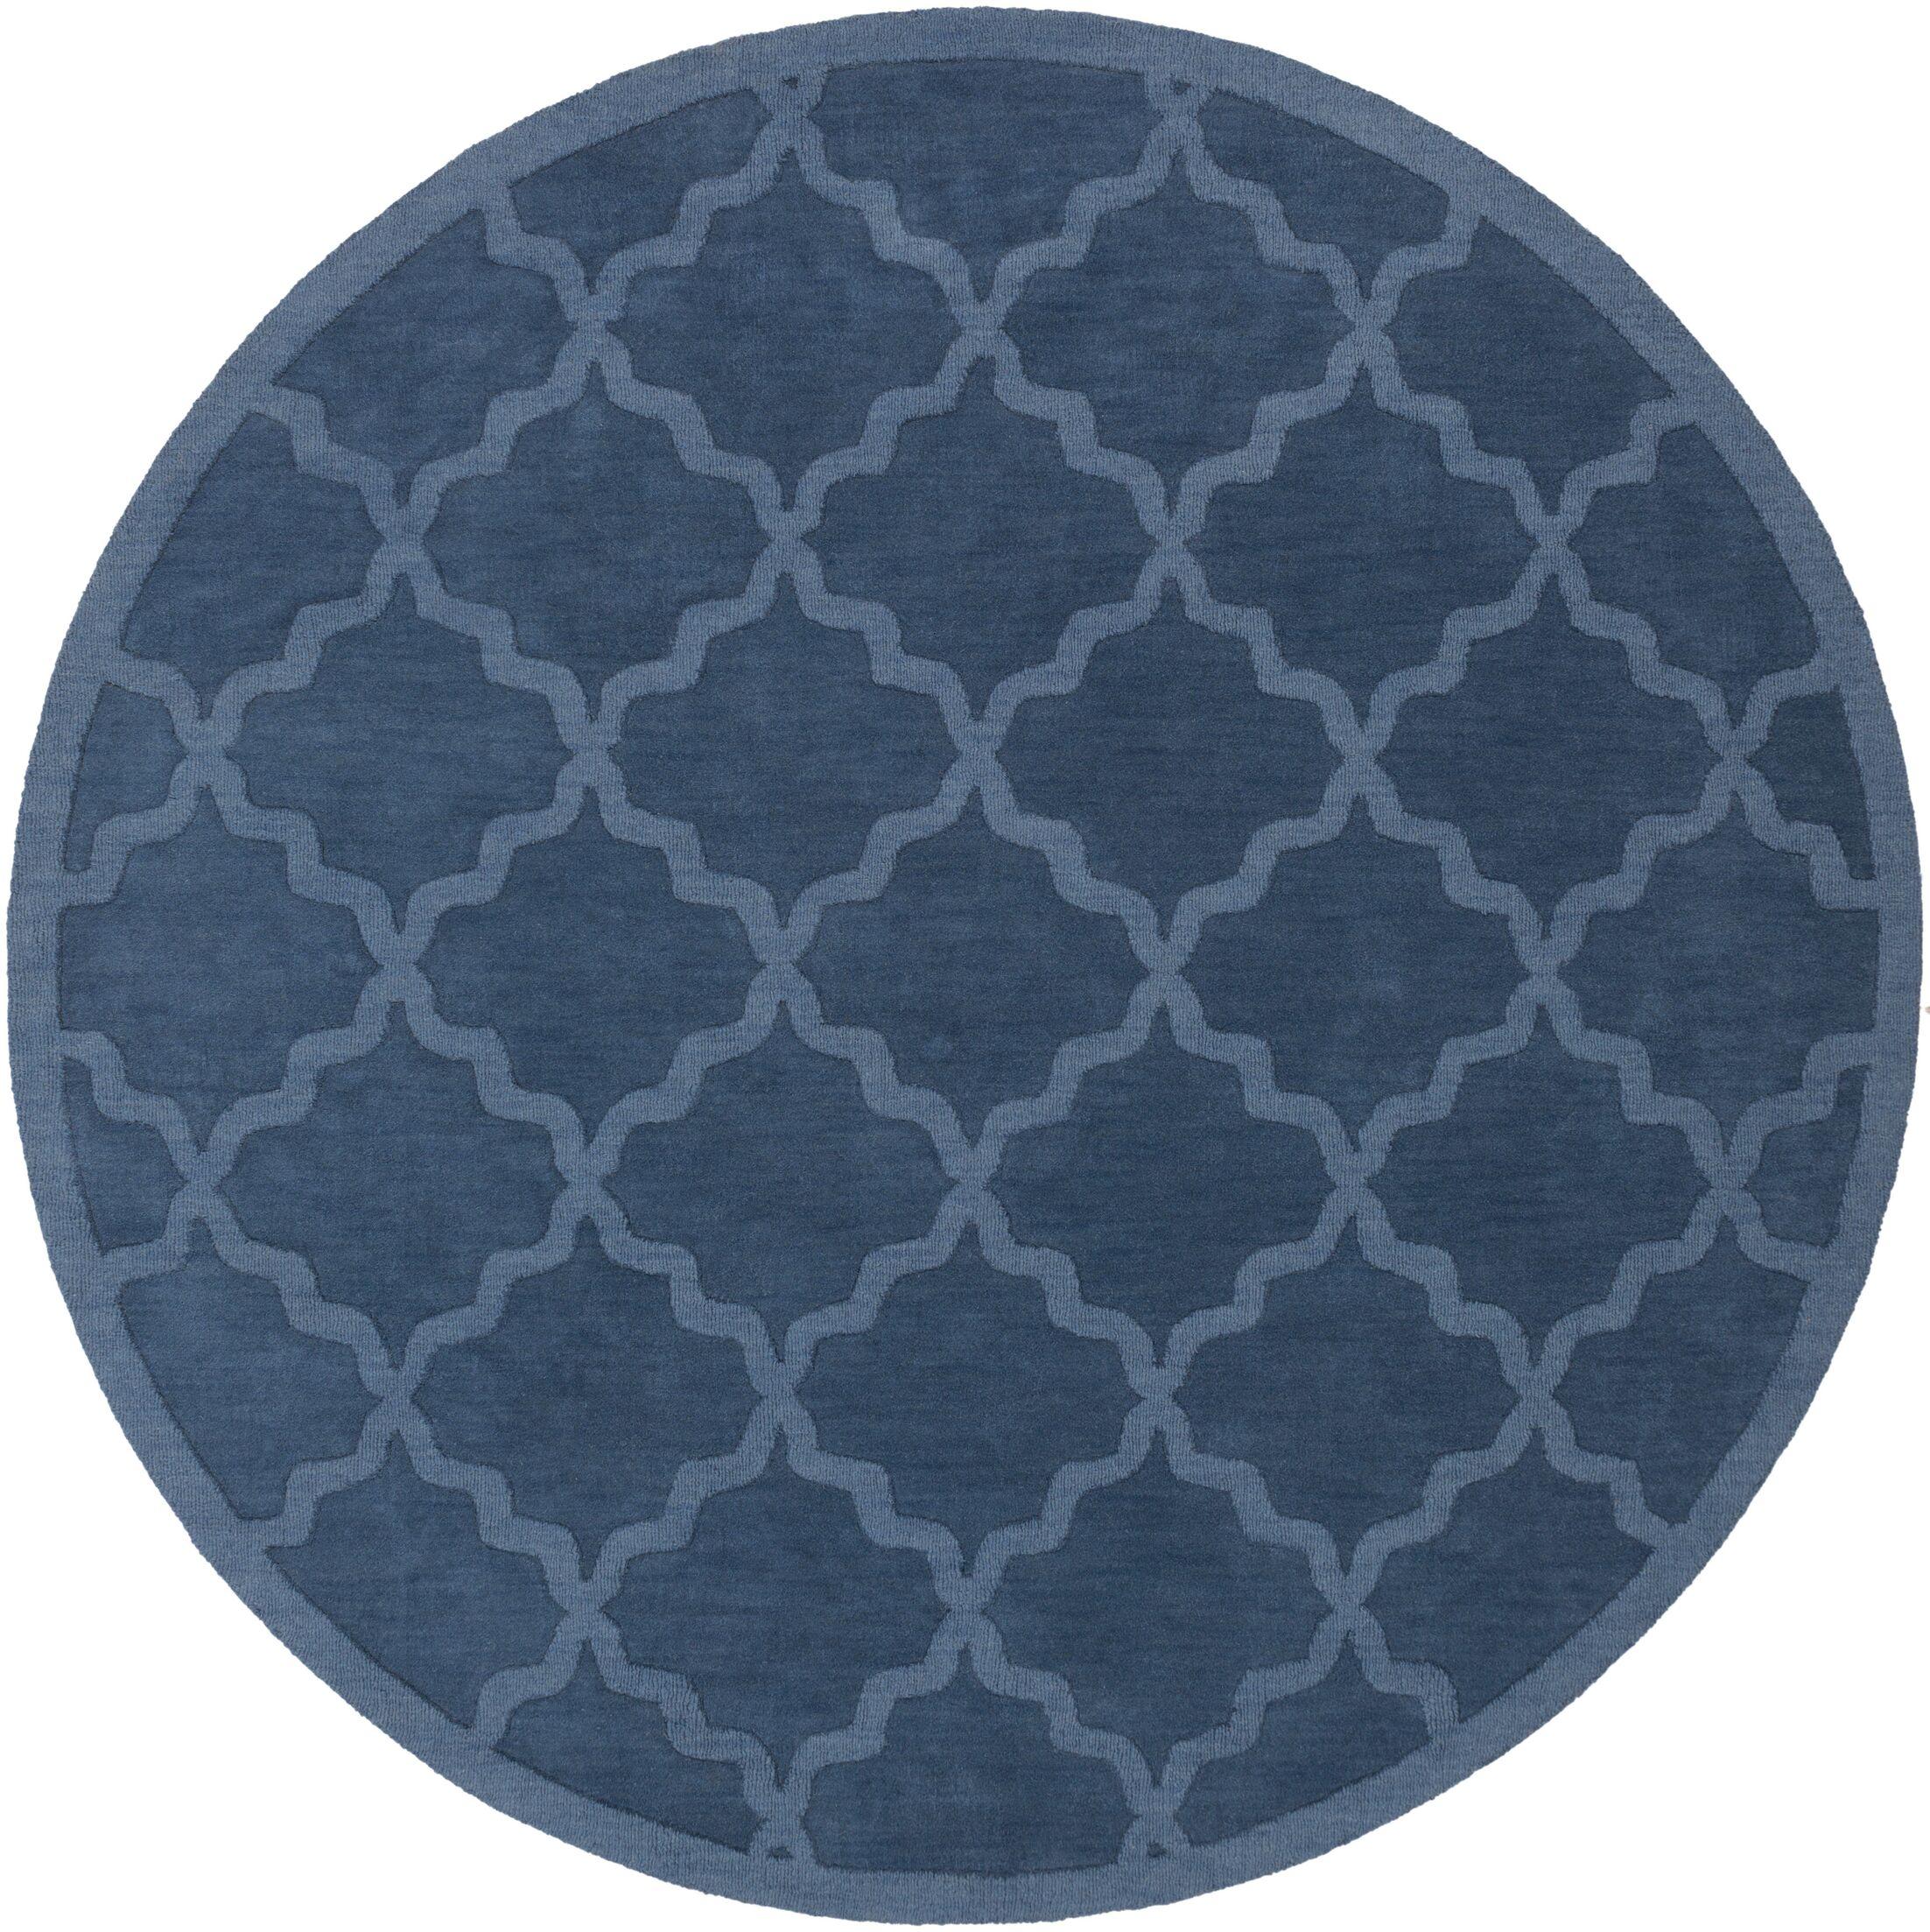 Blankenship Geometric Abbey Area Rug Rug Size: Round 9'9